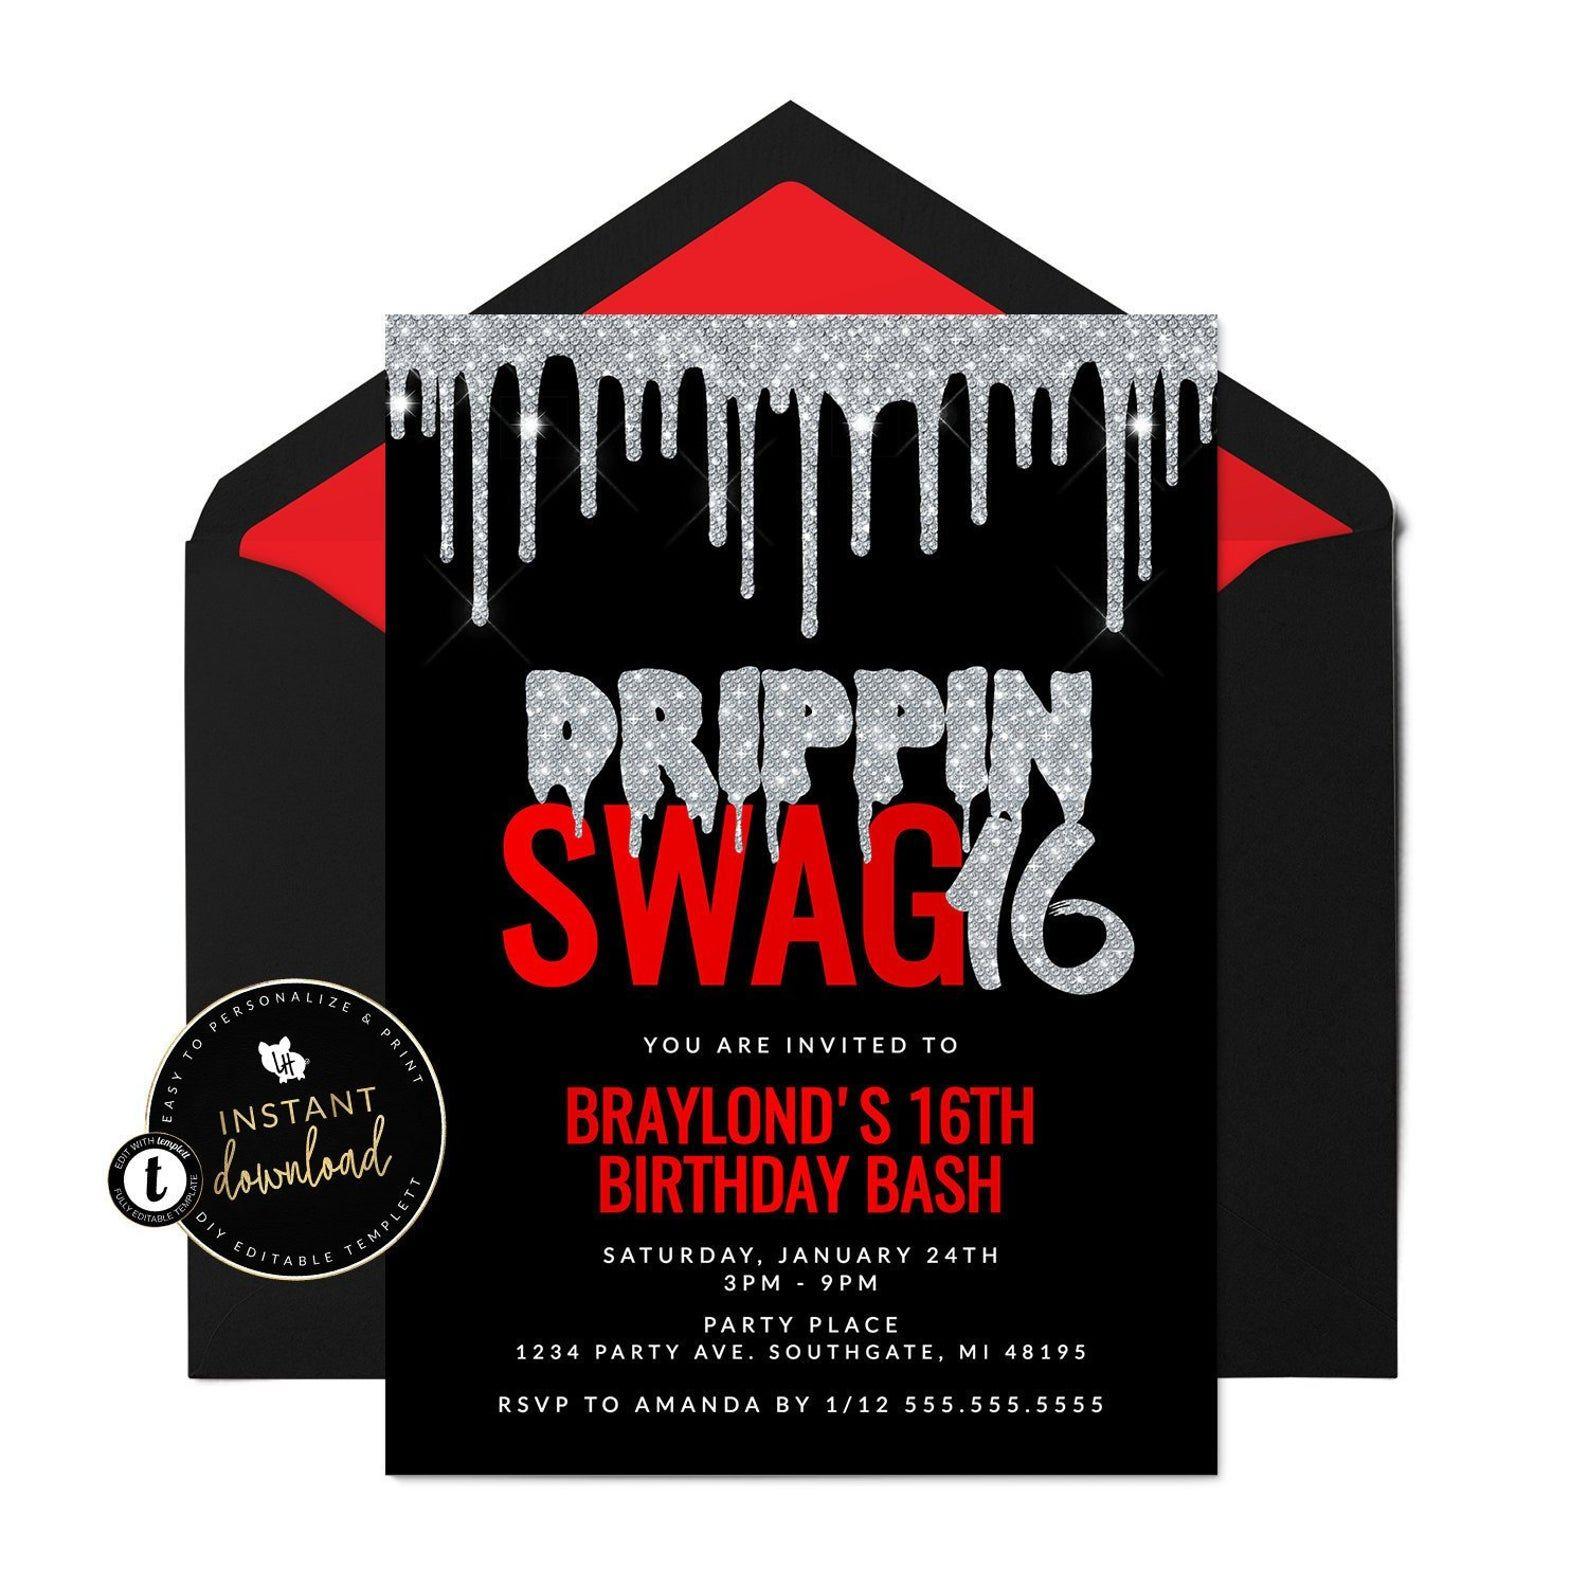 Drippin Swag 16 Invitation Bling Birthday Invitation Swag 16 Etsy In 2021 Boy 16th Birthday Sweet 16 Party Invitations Sweet 16 For Boys